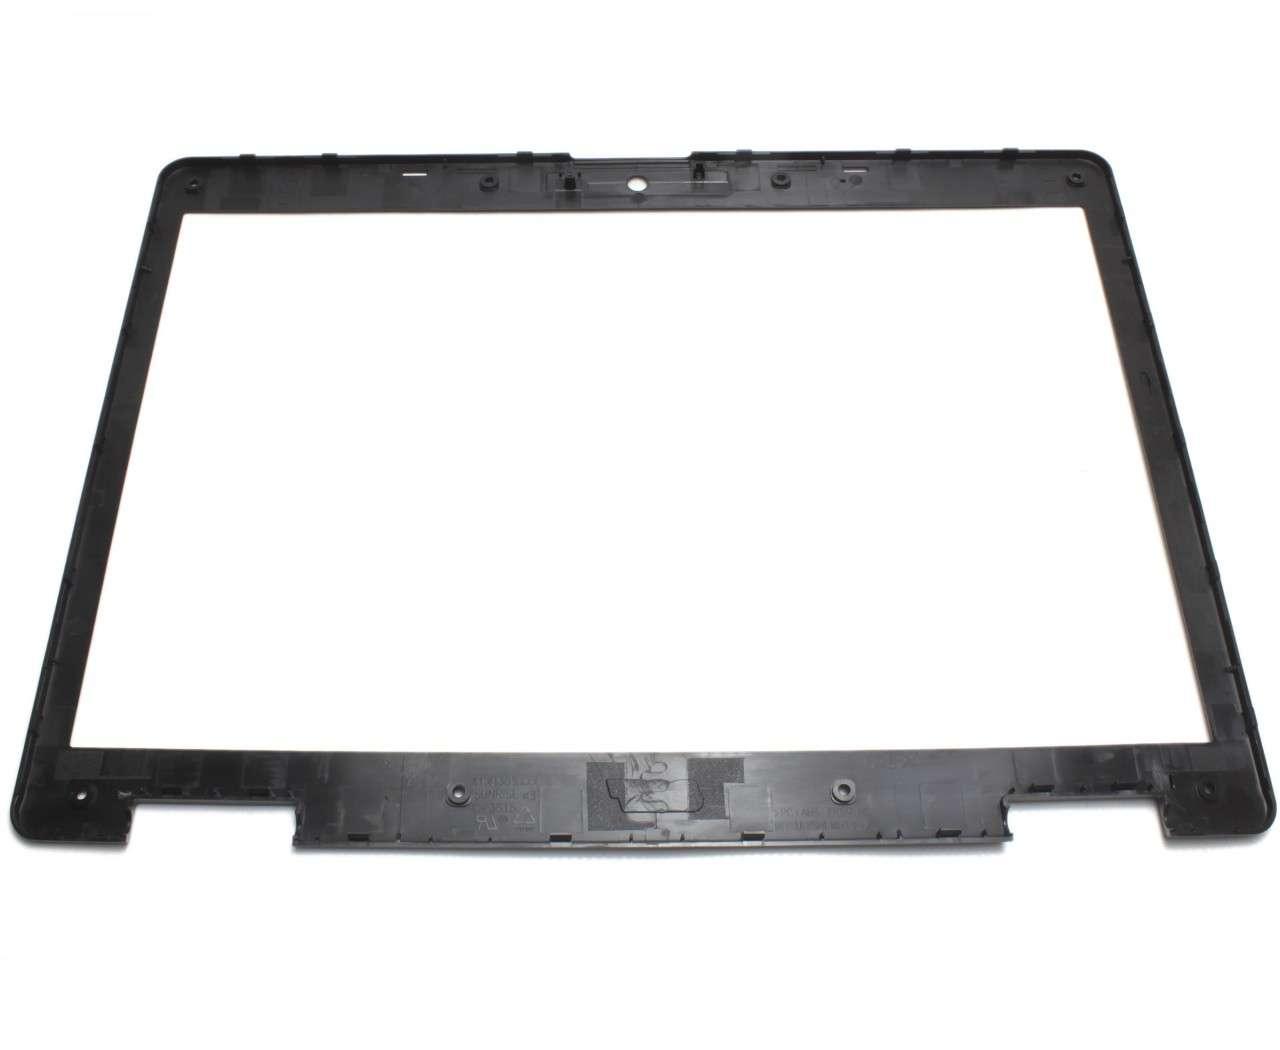 Rama Display Acer TravelMate 5520 Bezel Front Cover Neagra imagine